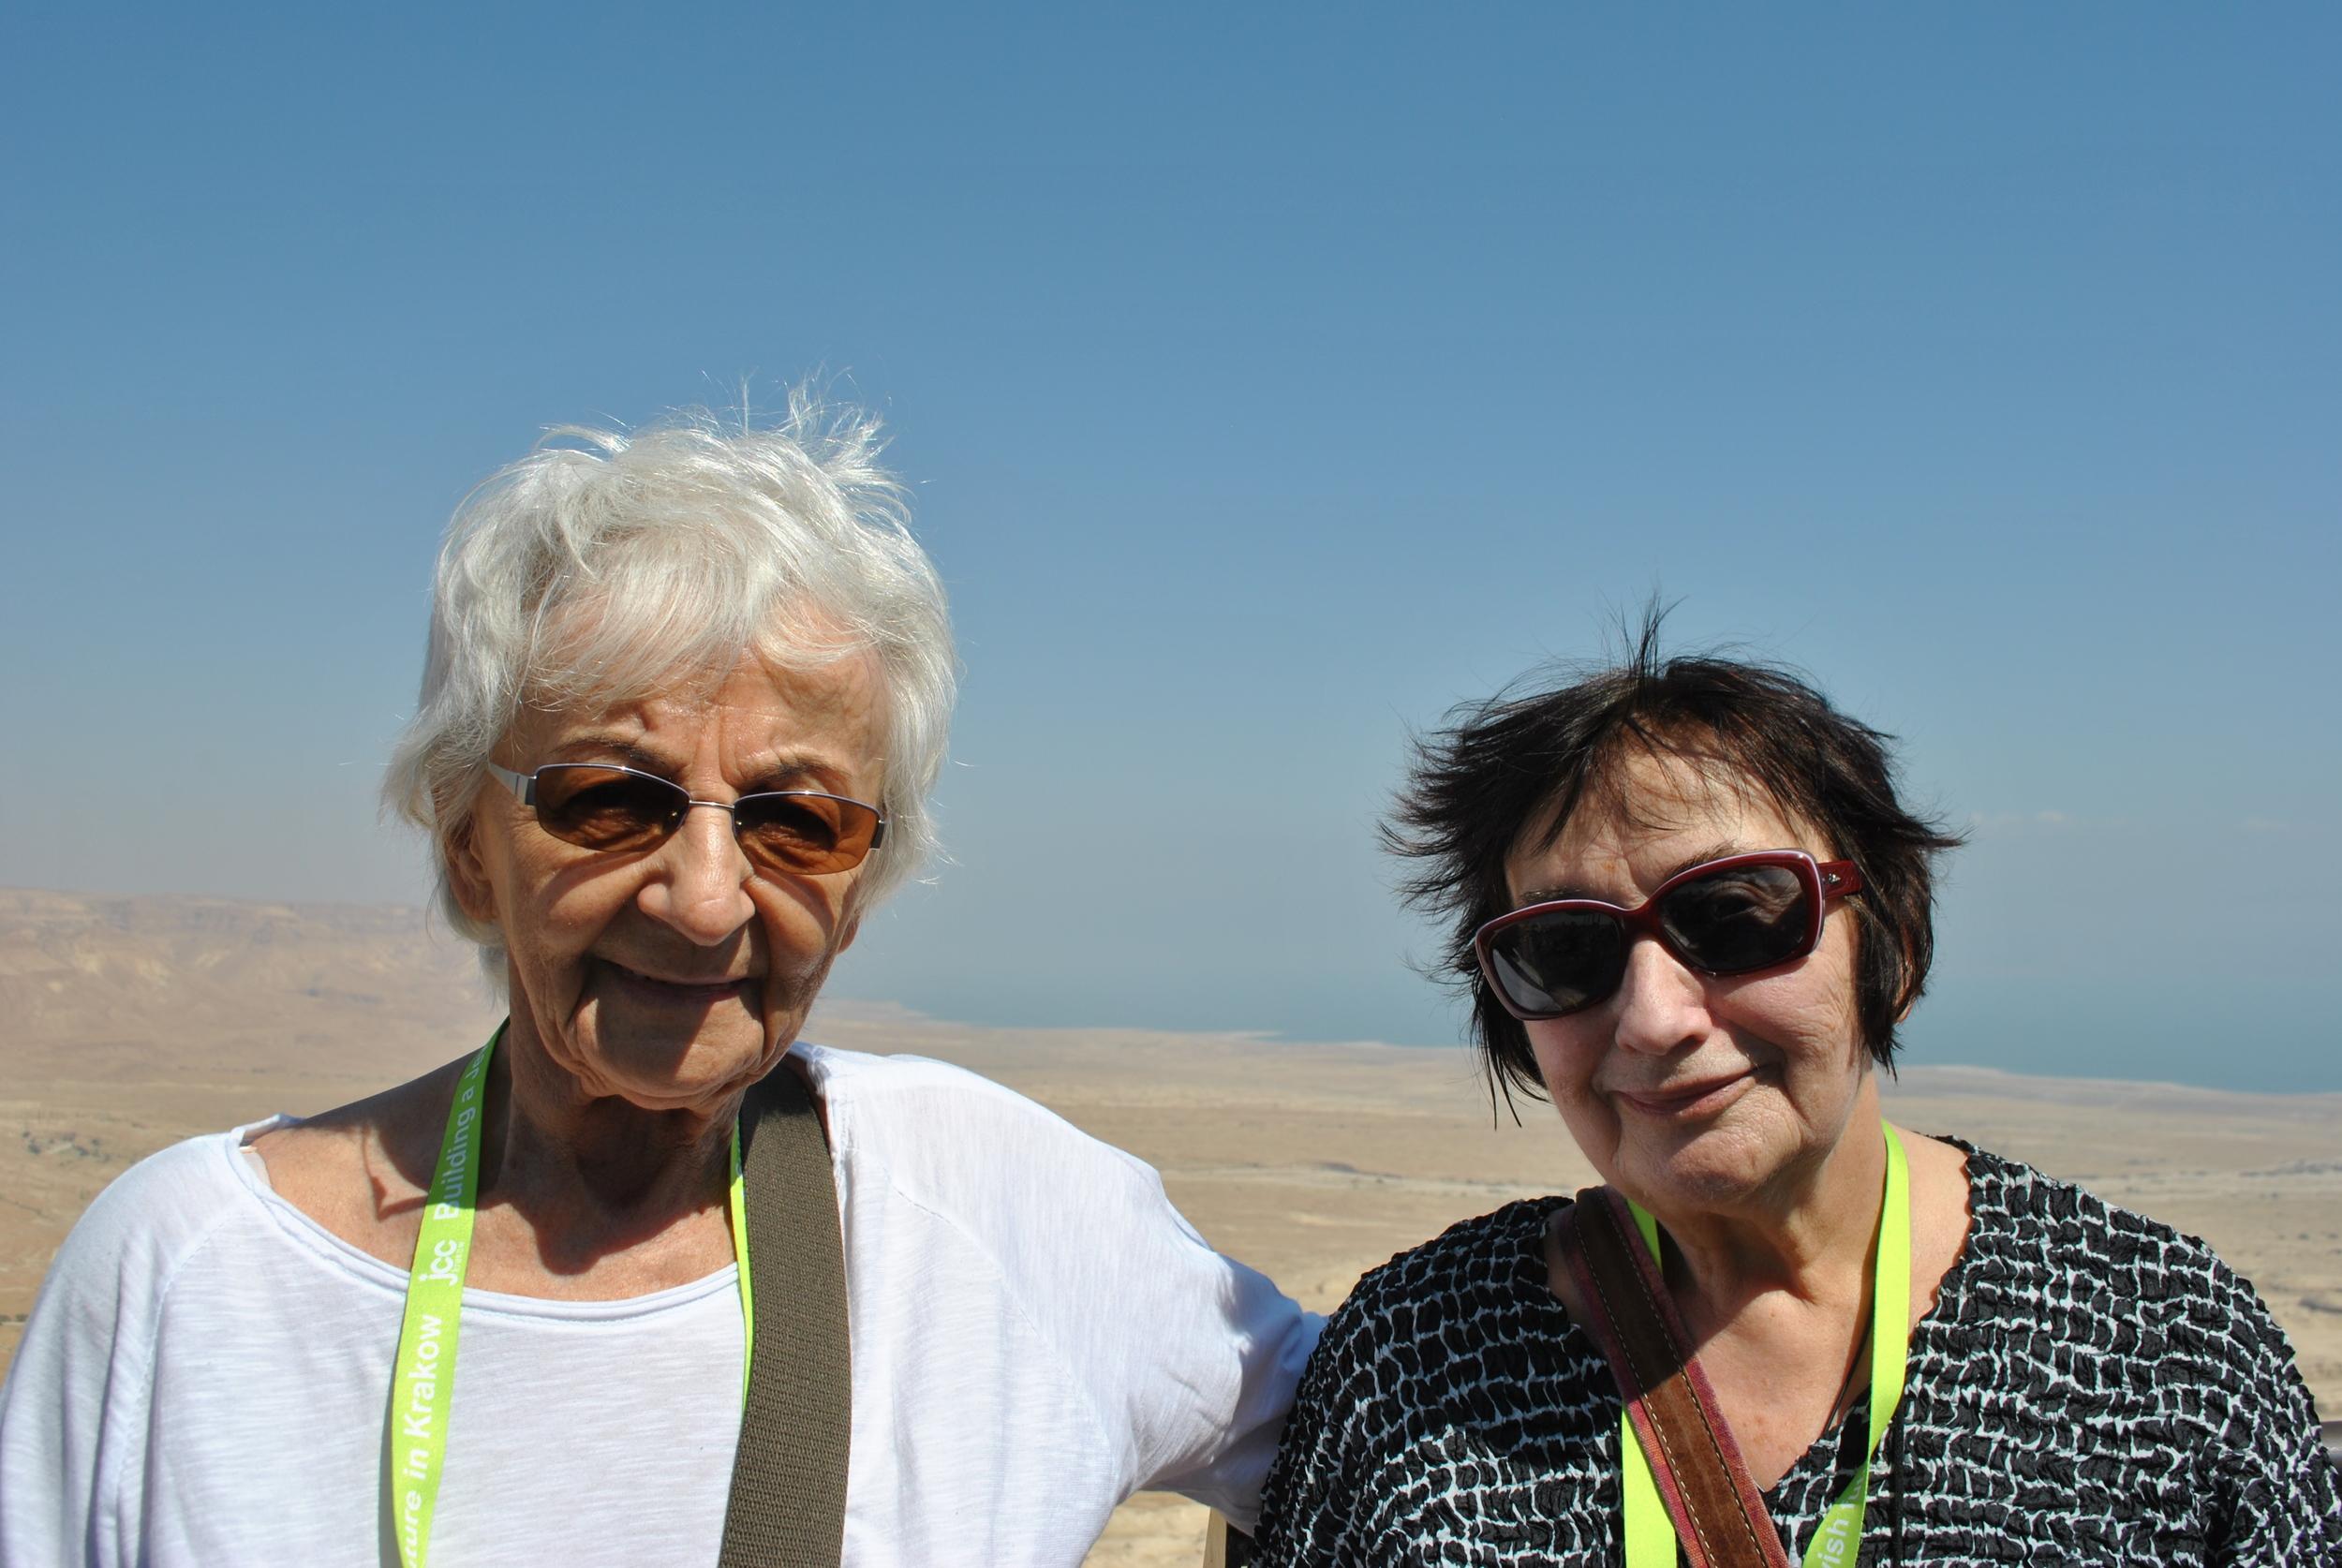 Krystyna and Pani Zosia at the Masada.